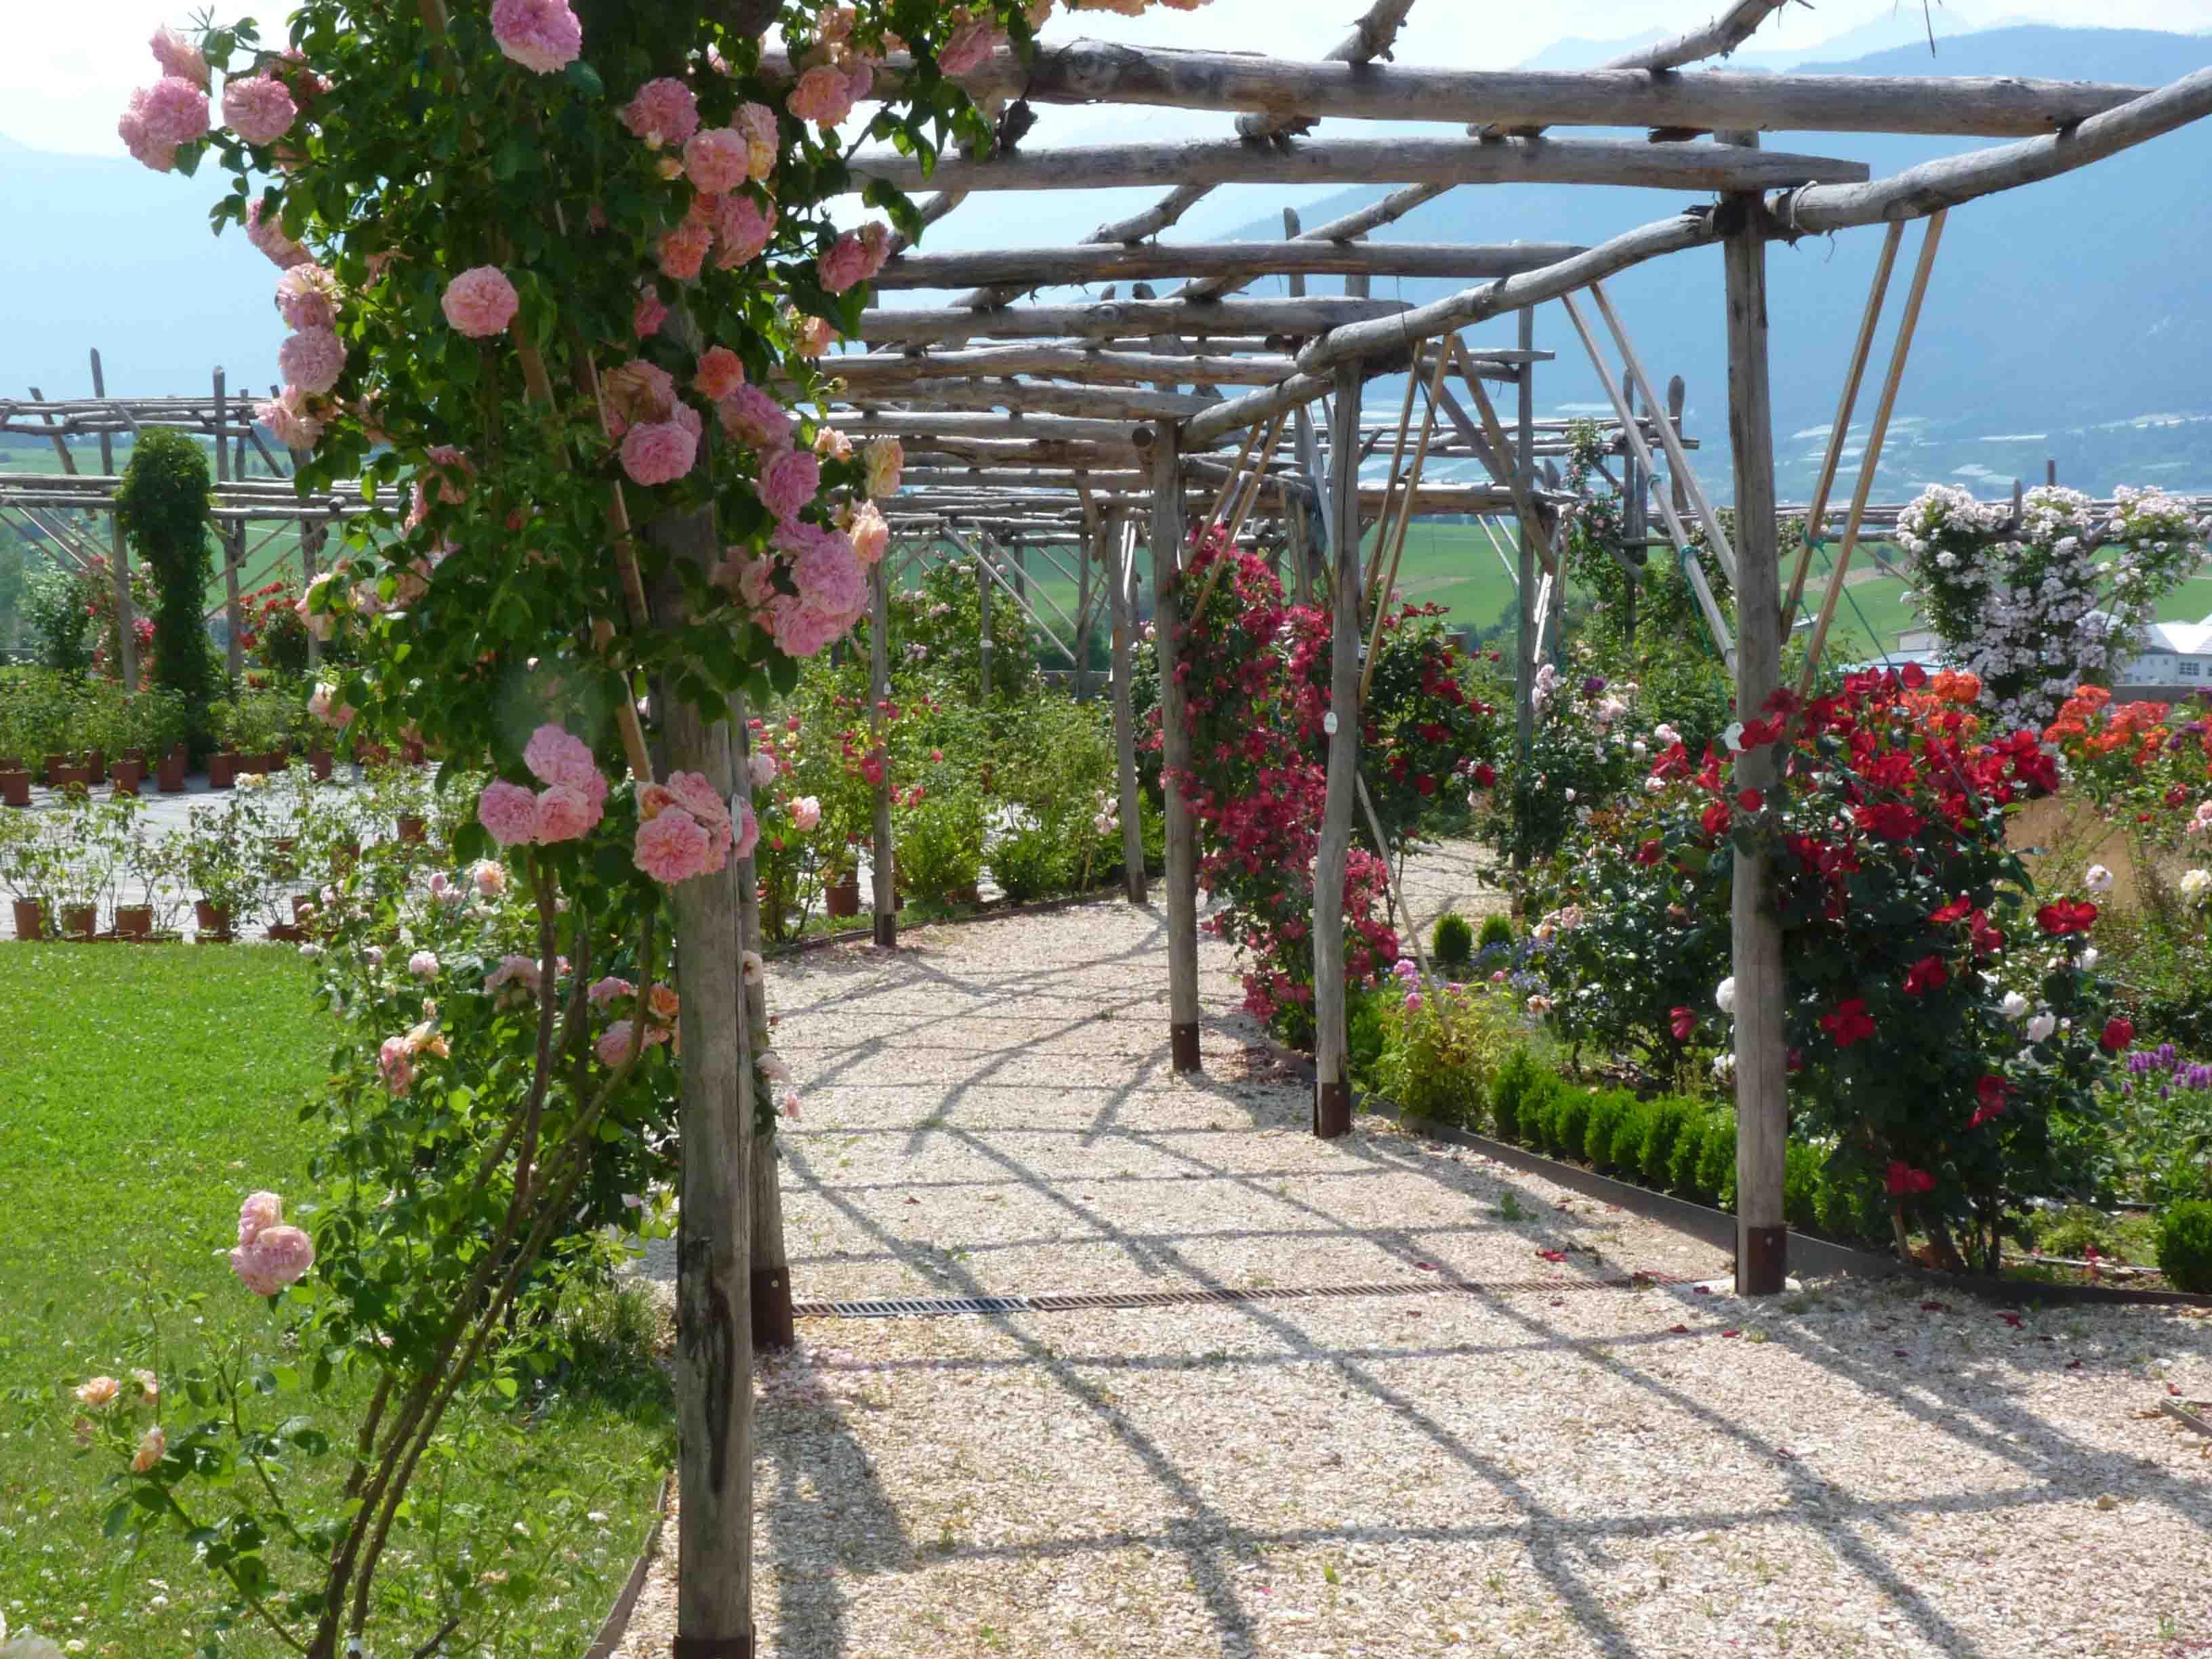 Grandi giardini italiani le novit classtravel - Il giardino di ausonia ...